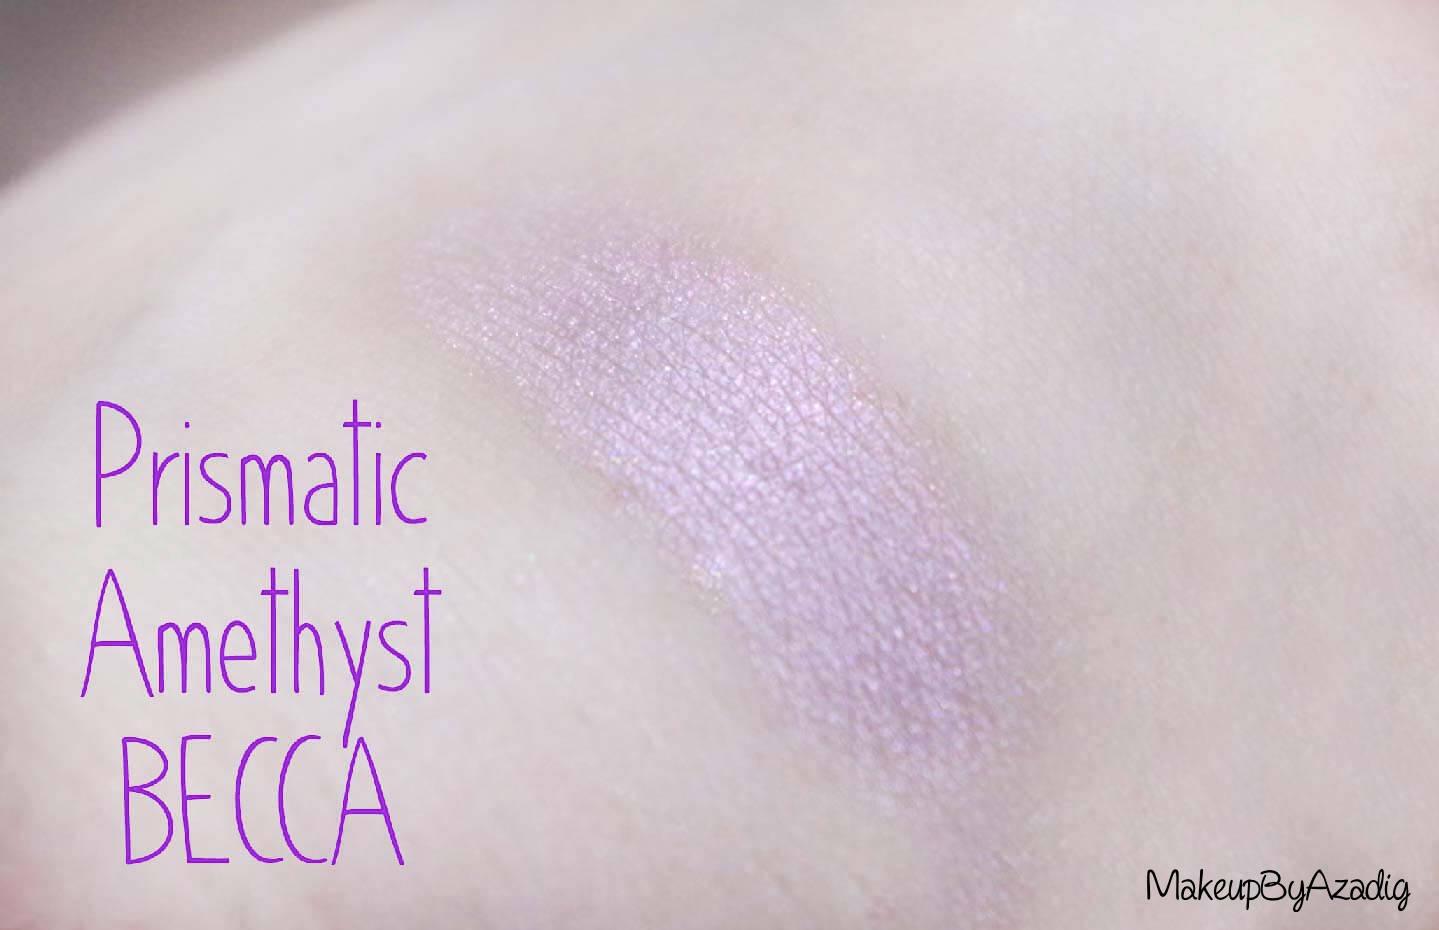 revue-becca-shimmering-skin-perfector-pressed-highlighter-enlumineur-violet-prismatic-amethyst-avis-swatch-prix-makeupbyazadig-swatches